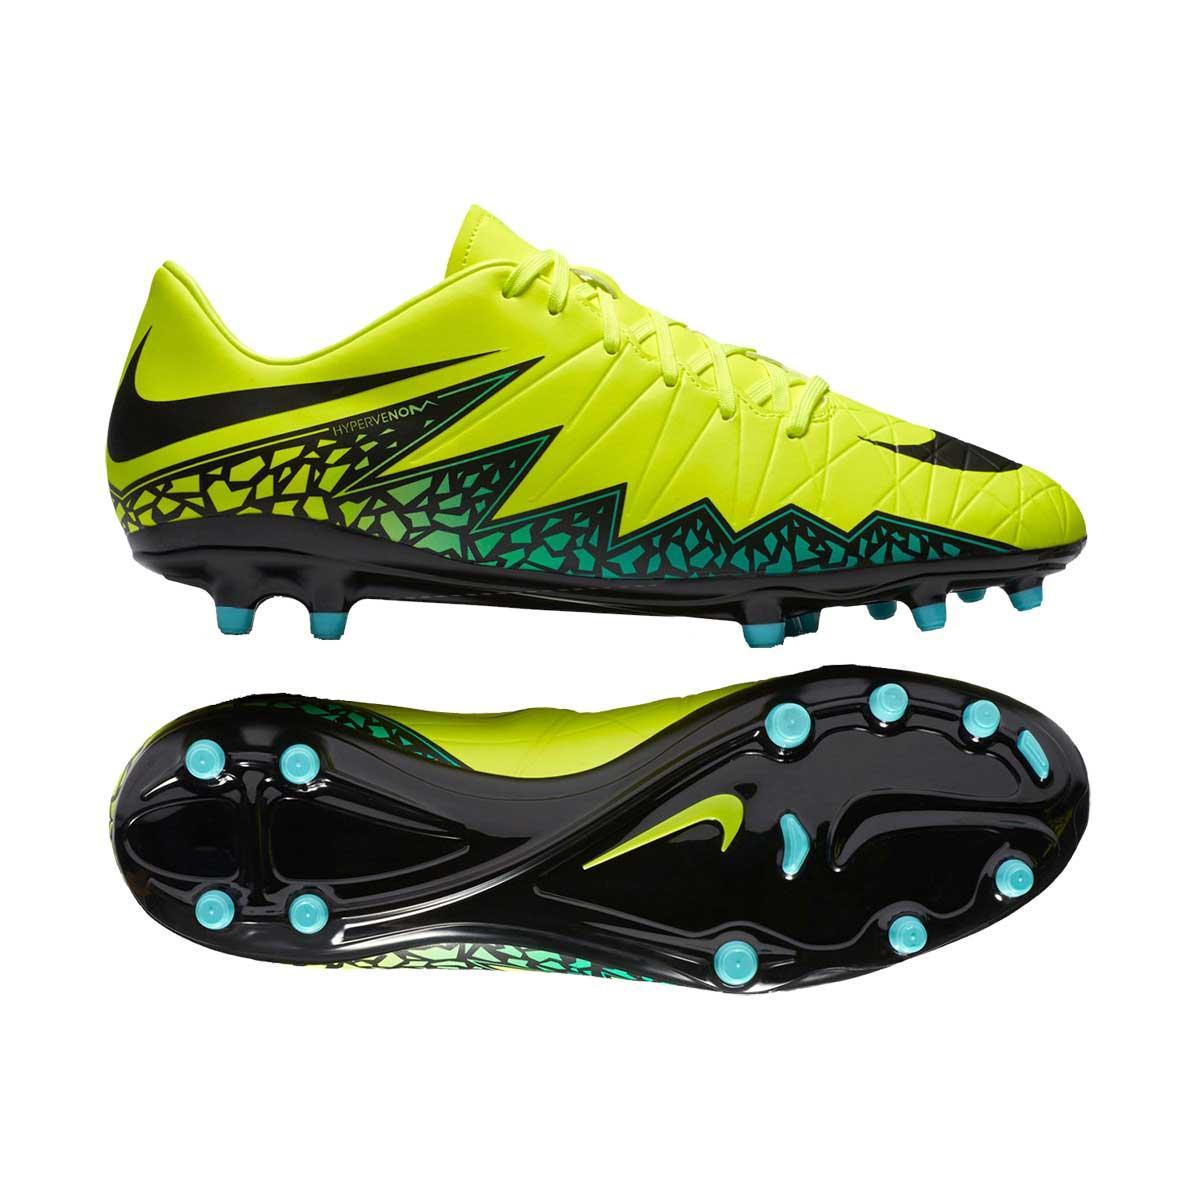 Proponer Educación moral paracaídas  Buy Nike Hypervenom Phelon II FG Football Shoes (Volt/Black) Online